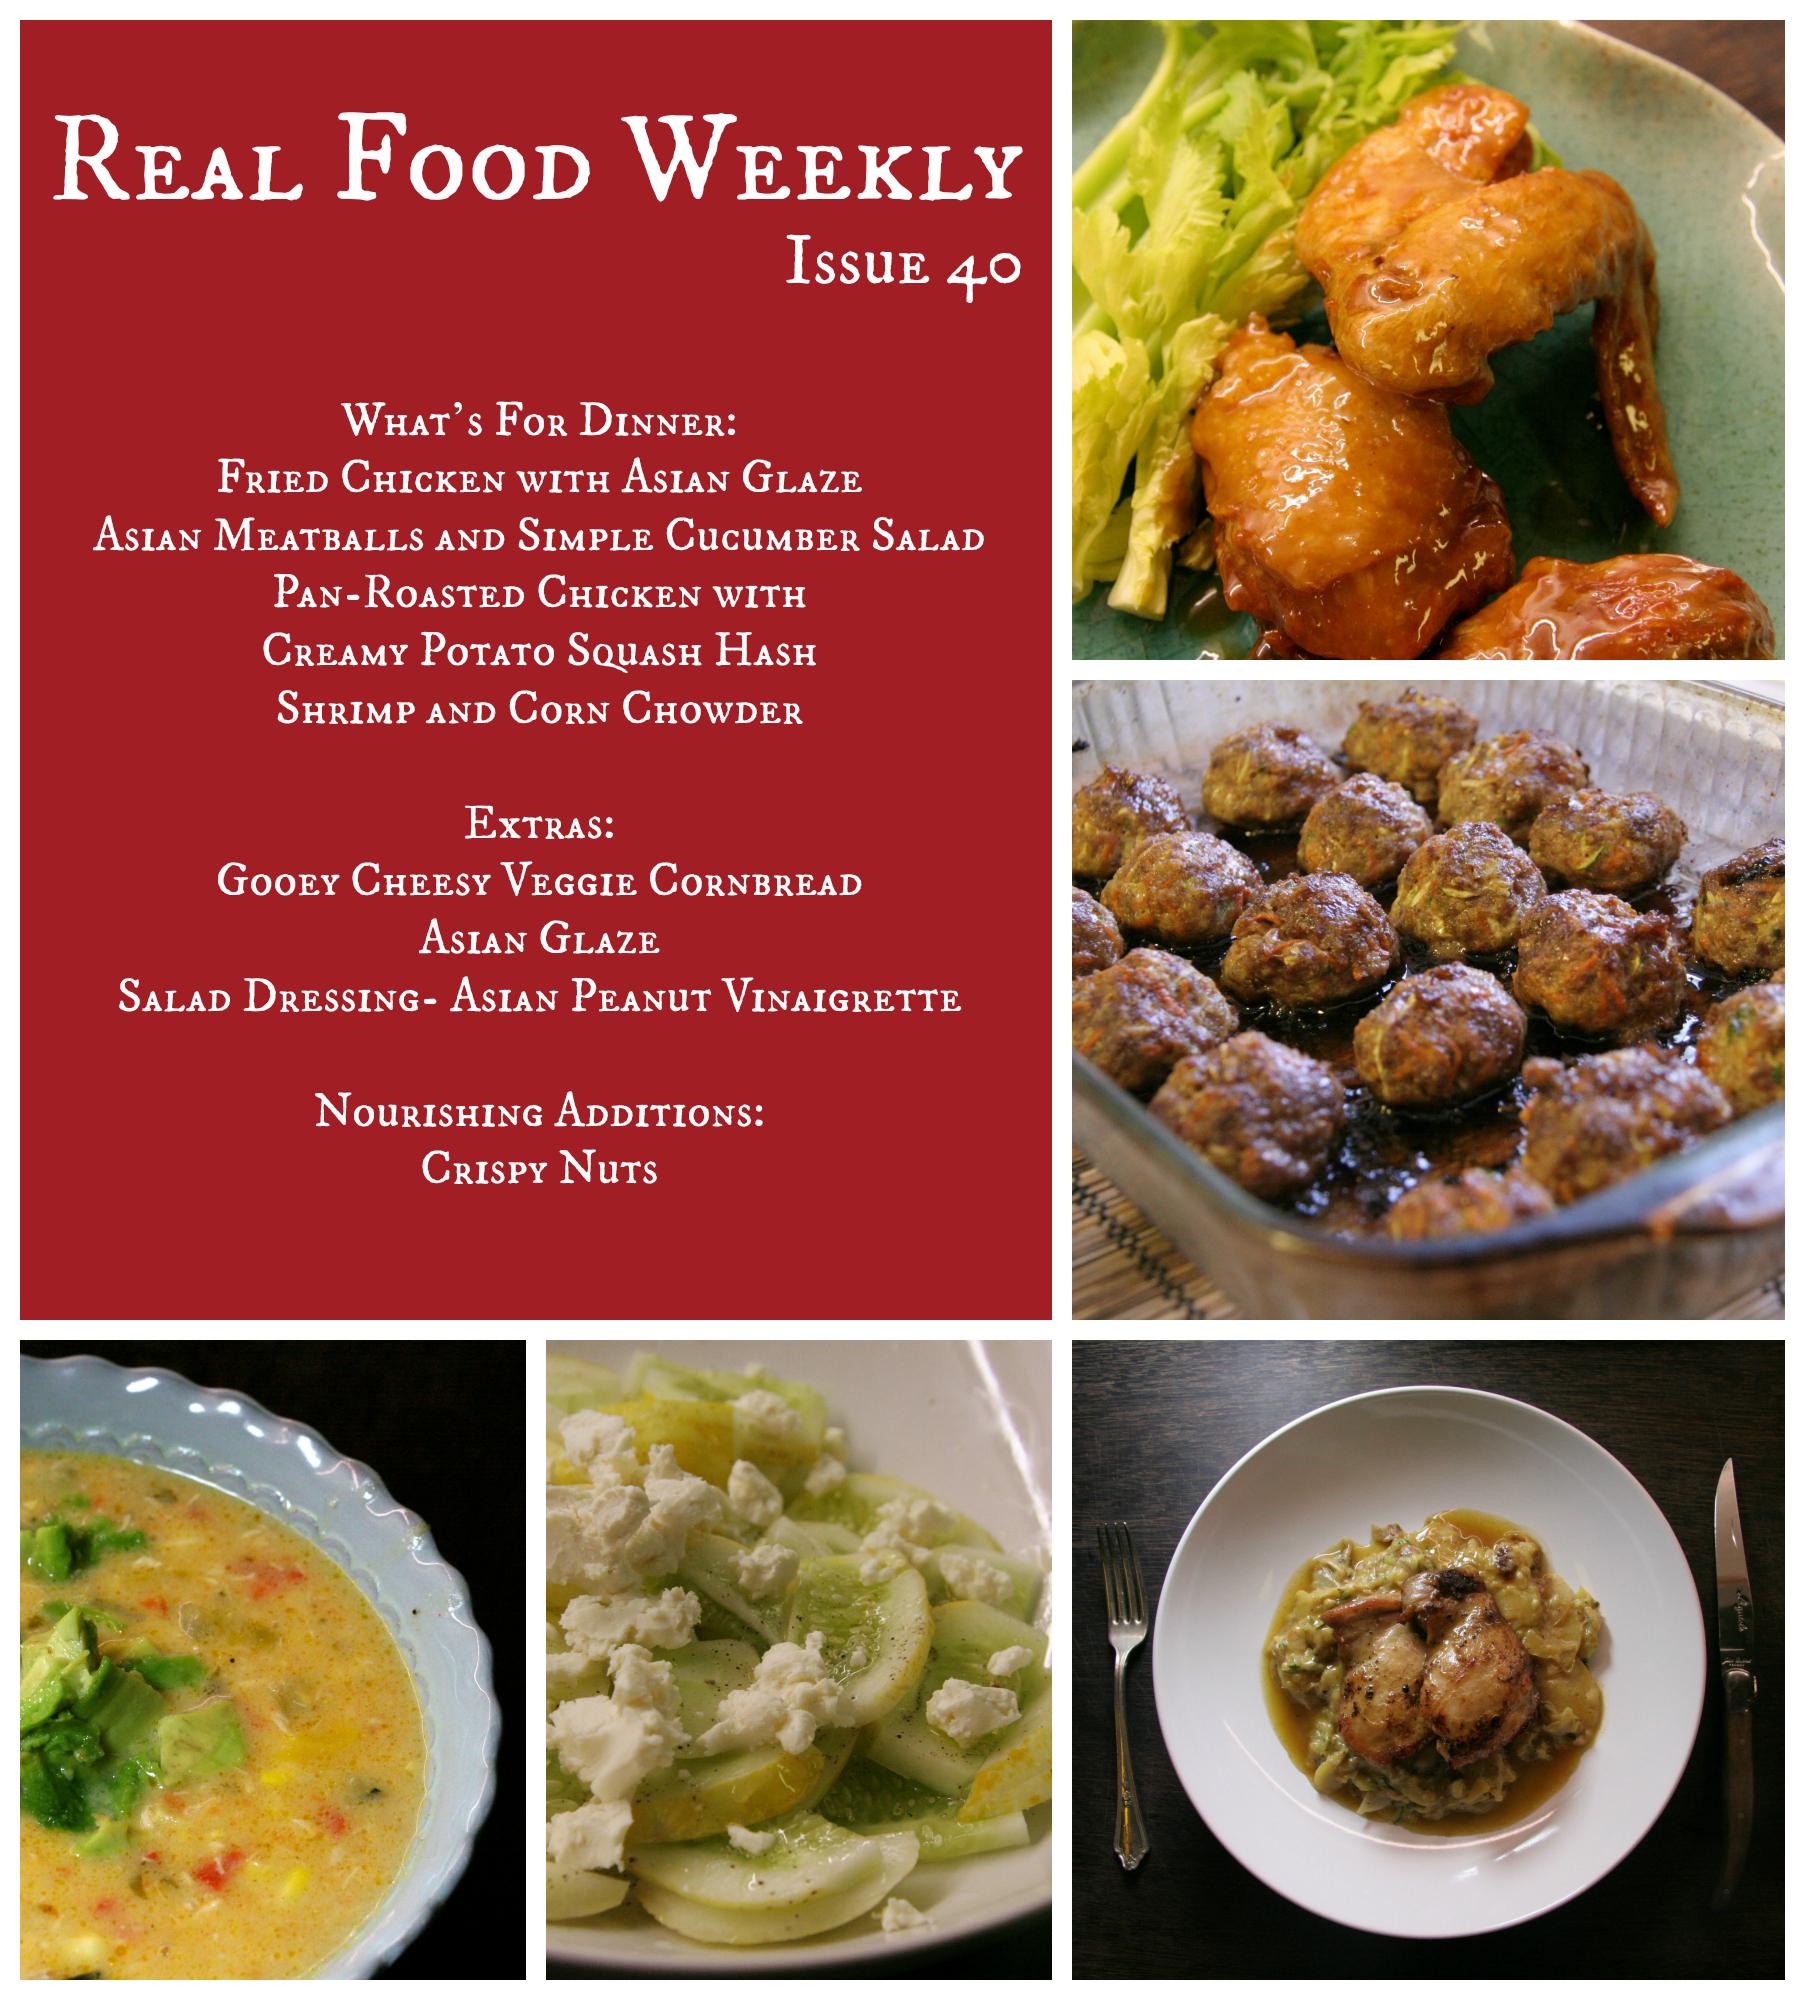 July 20, 2013 Meal Plan